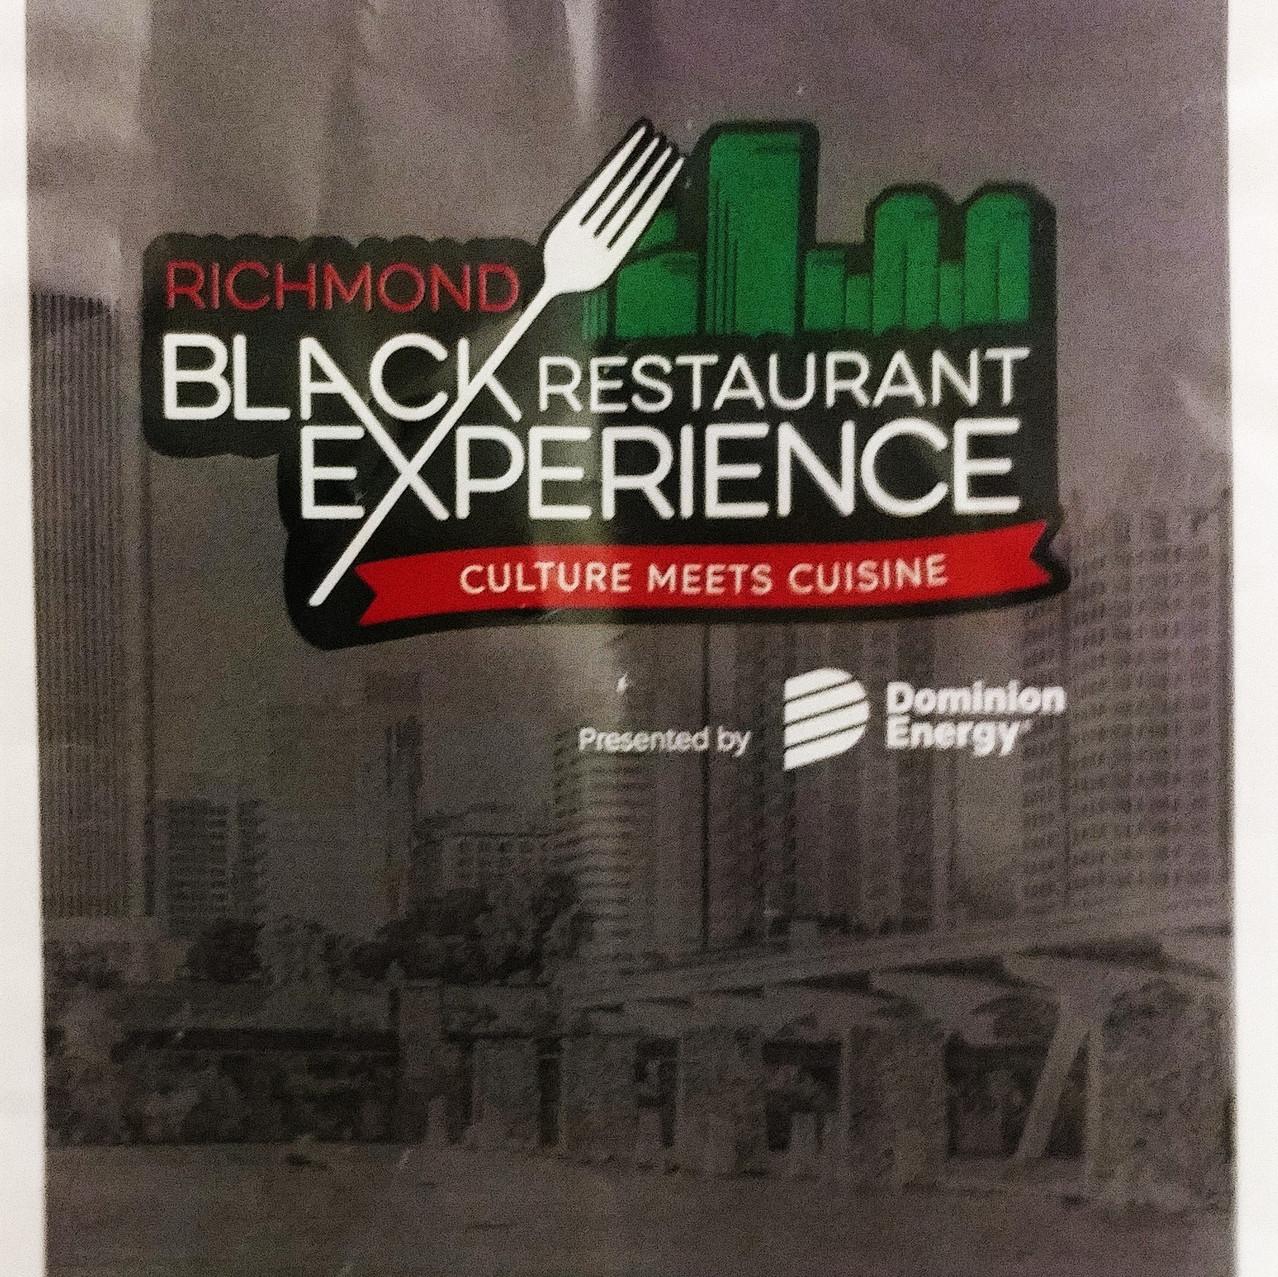 Richmond Black Restaurant Experience